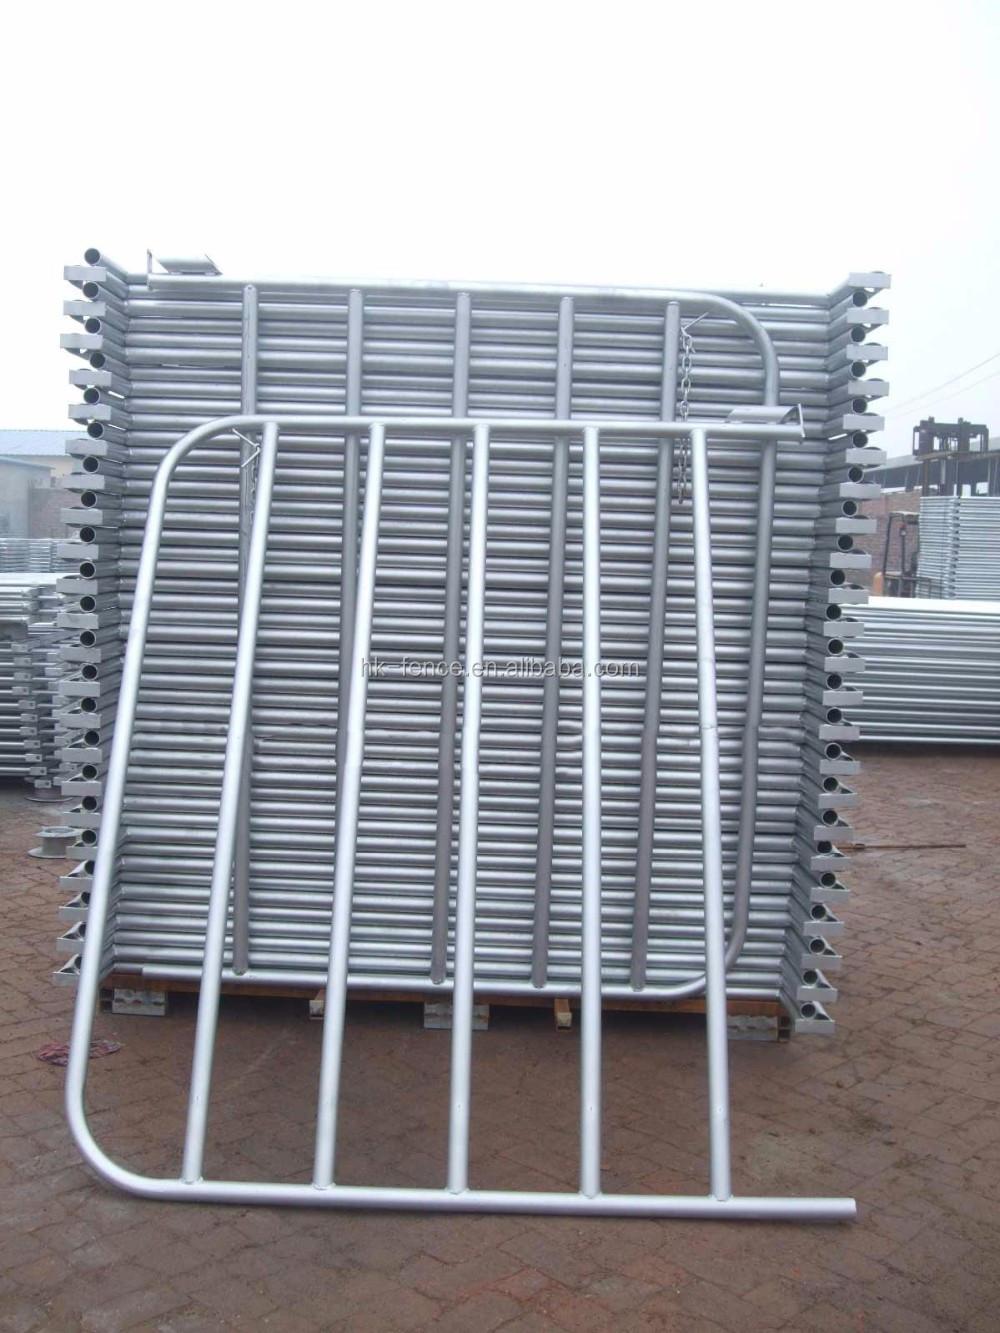 Portable Steel Fencing : Galvanized round pipe portable metal horse livestock farm